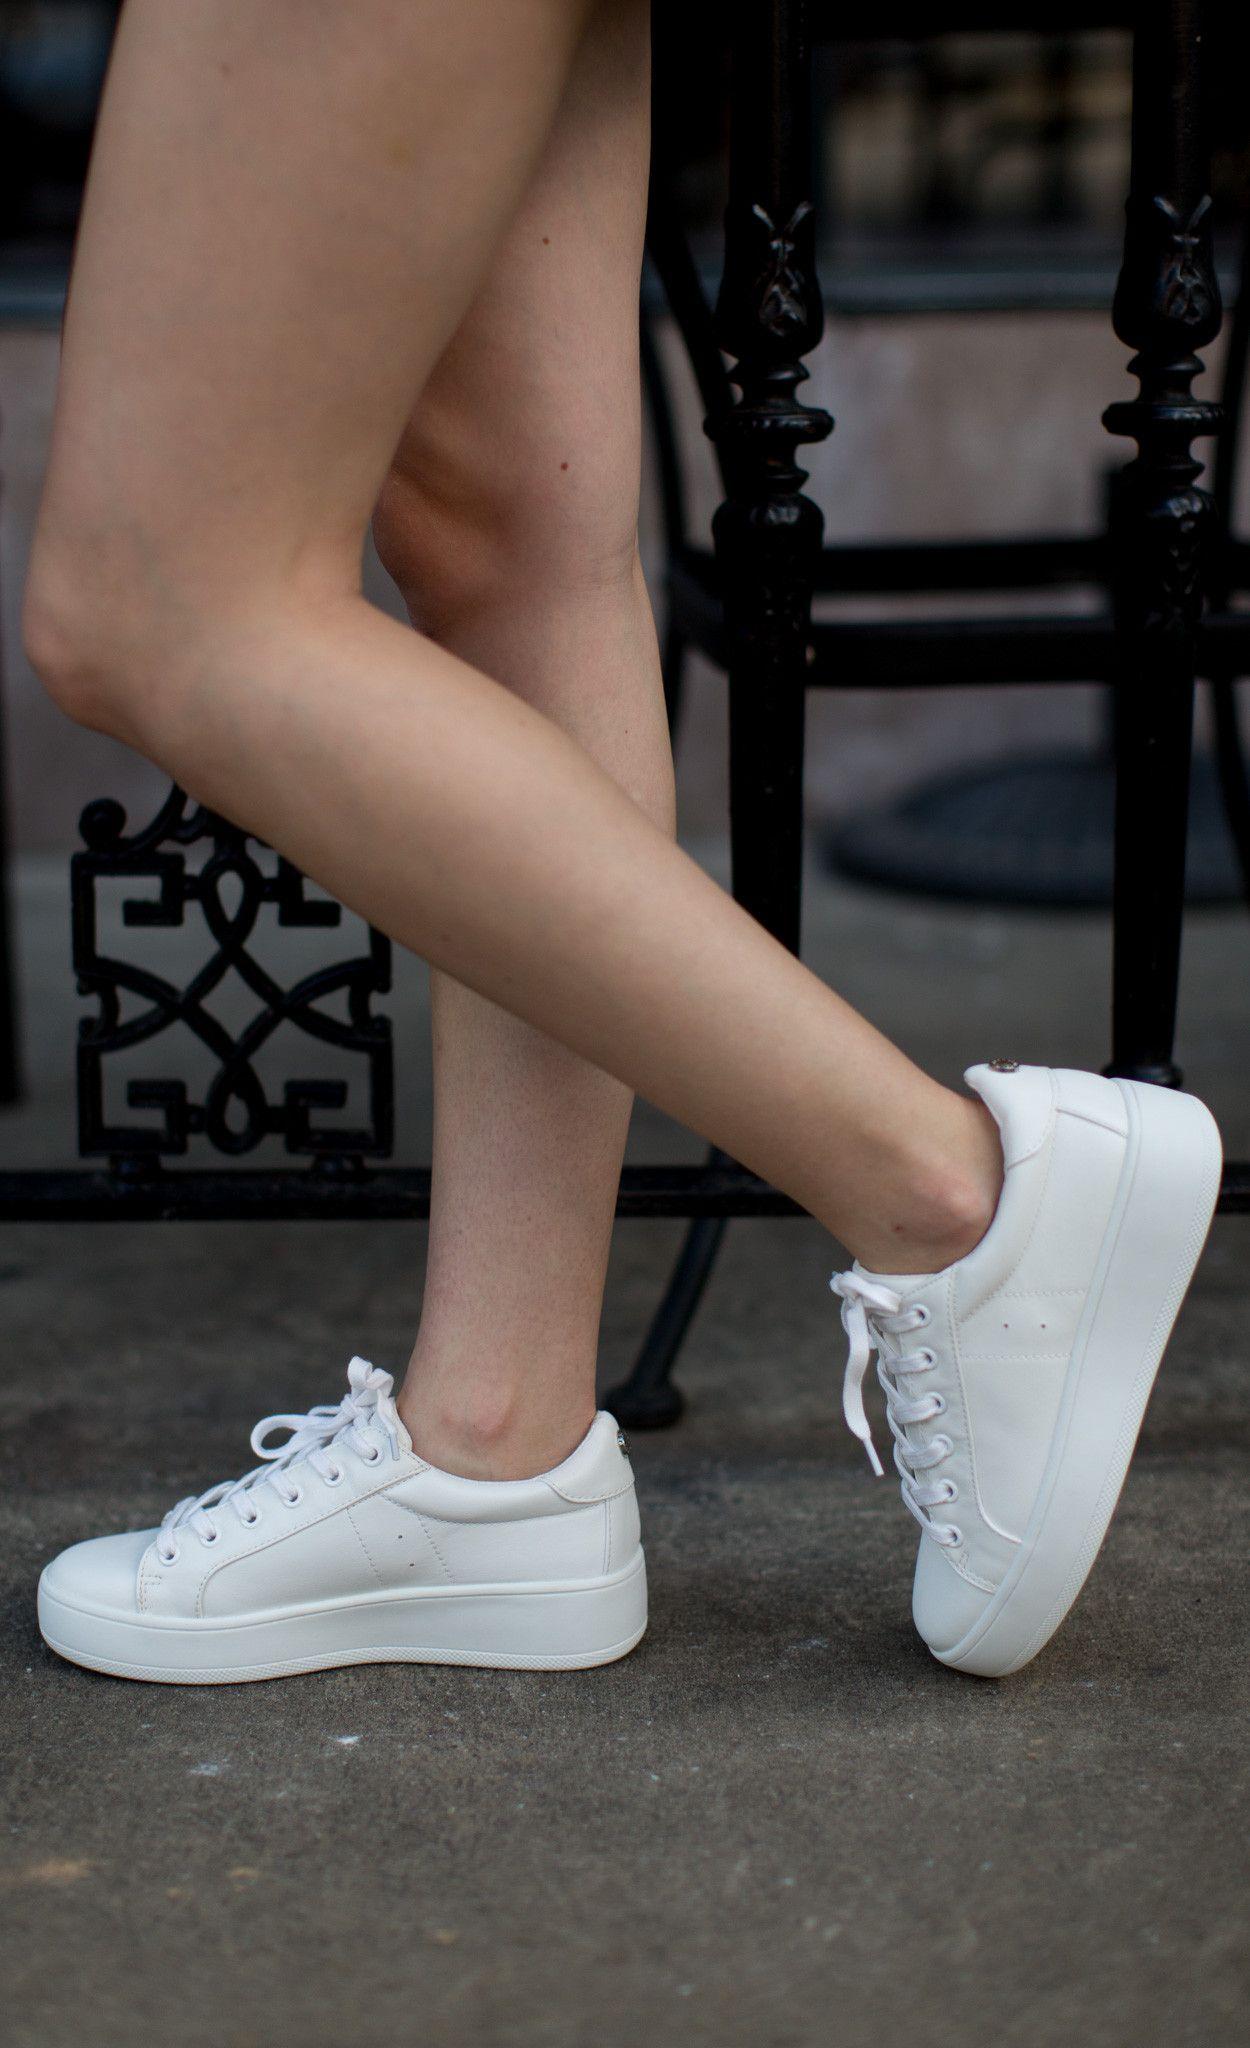 Steve Madden - Shoe - Steve Madden Bertie Sneaker - White - Cheeky Peach  Boutique -